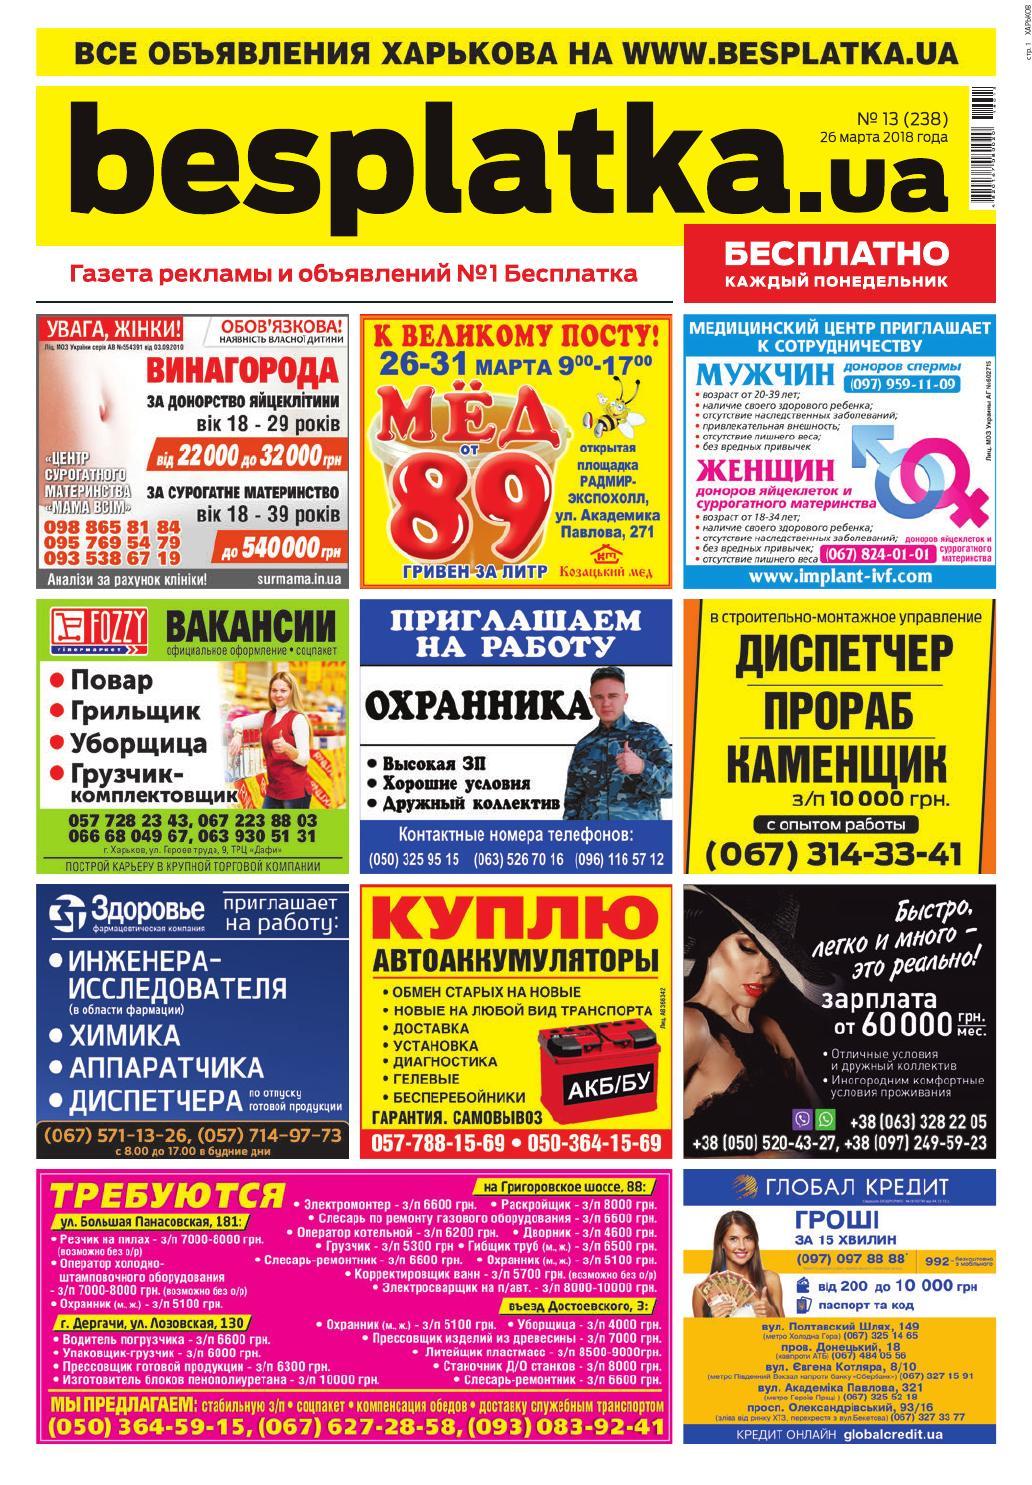 a3fbc4ce7ec6 Besplatka  13 Харьков by besplatka ukraine - issuu